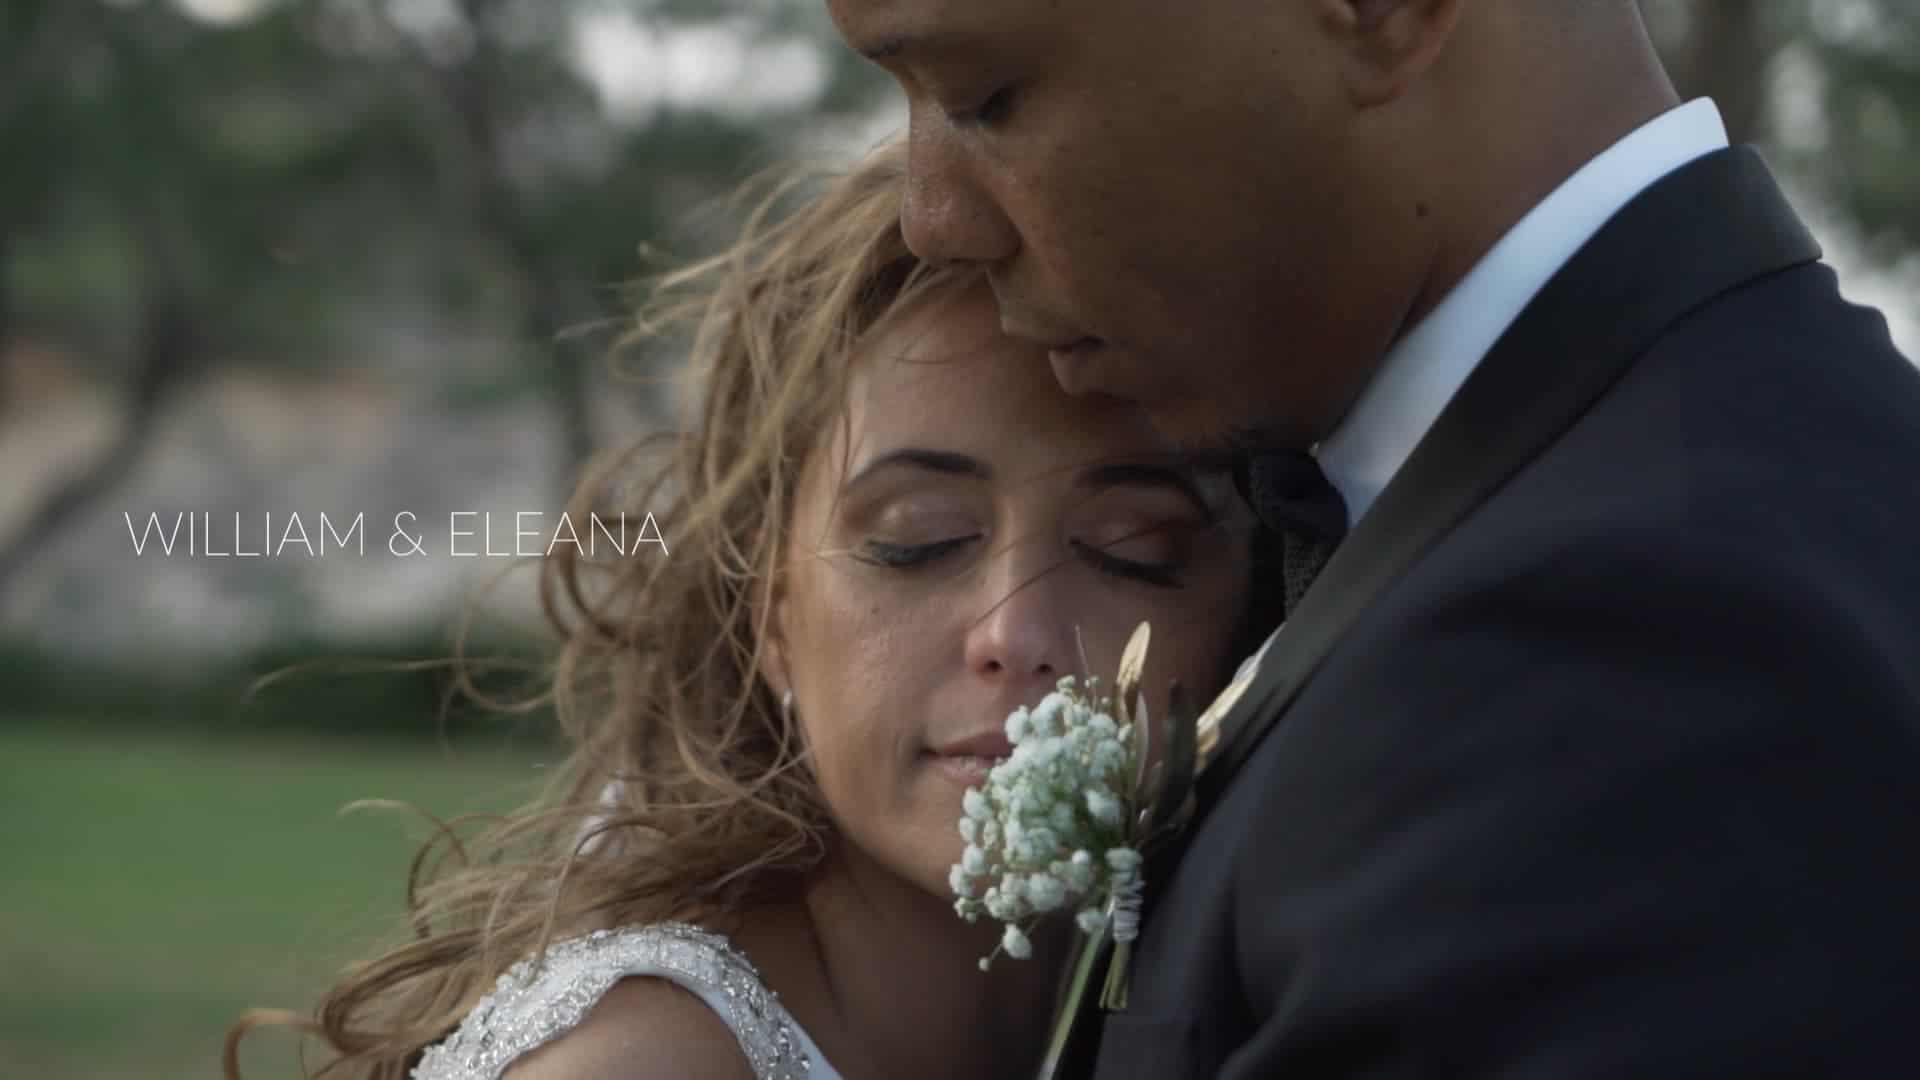 Wedding Video - From Dubai to Greece - Island Athens Riviera